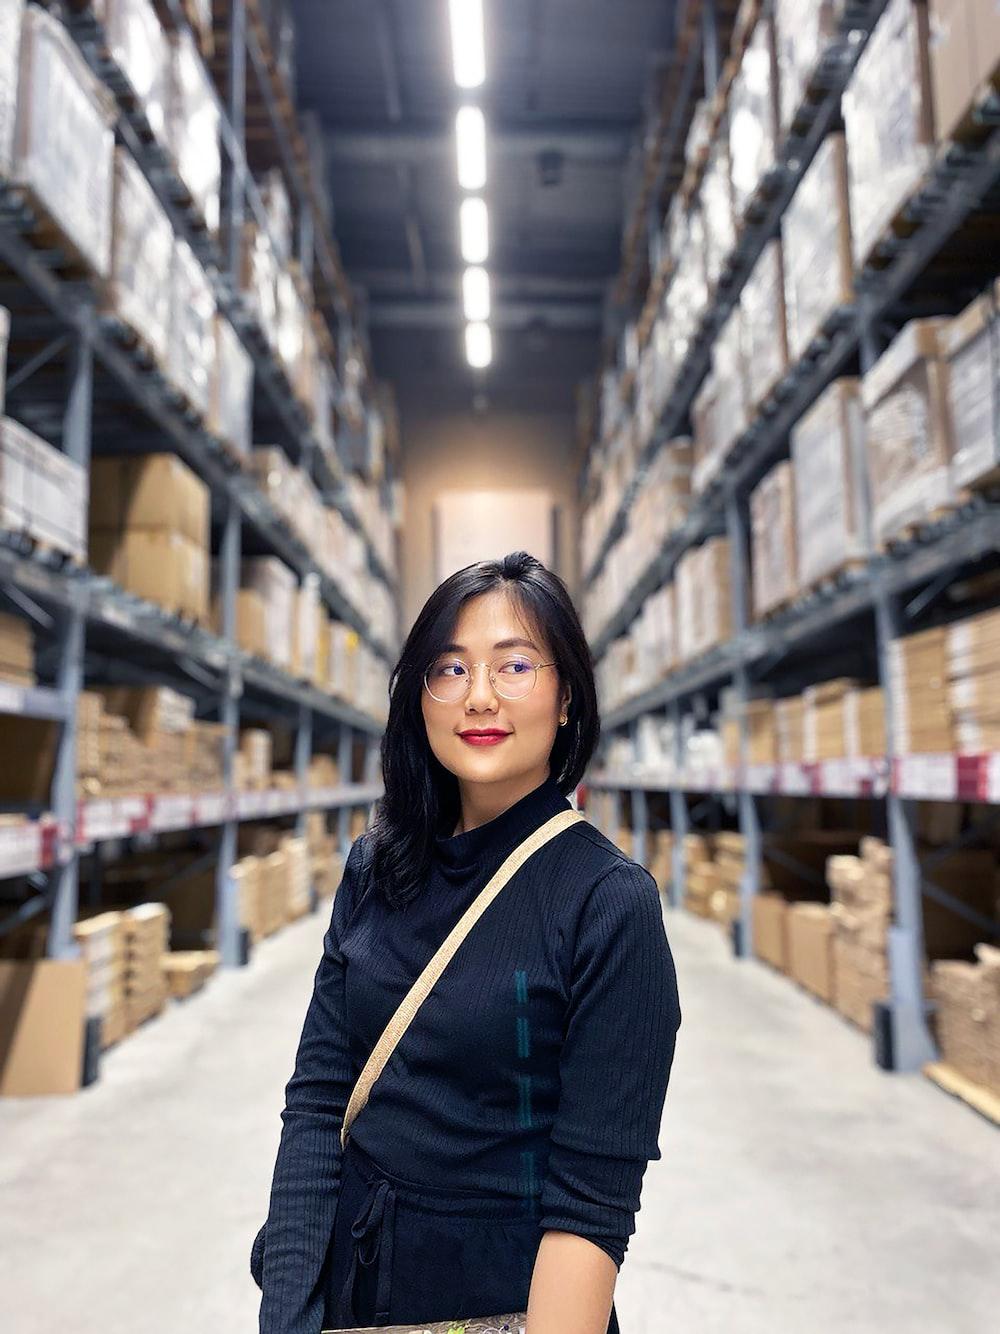 woman in black long sleeve shirt standing near brown wooden shelf